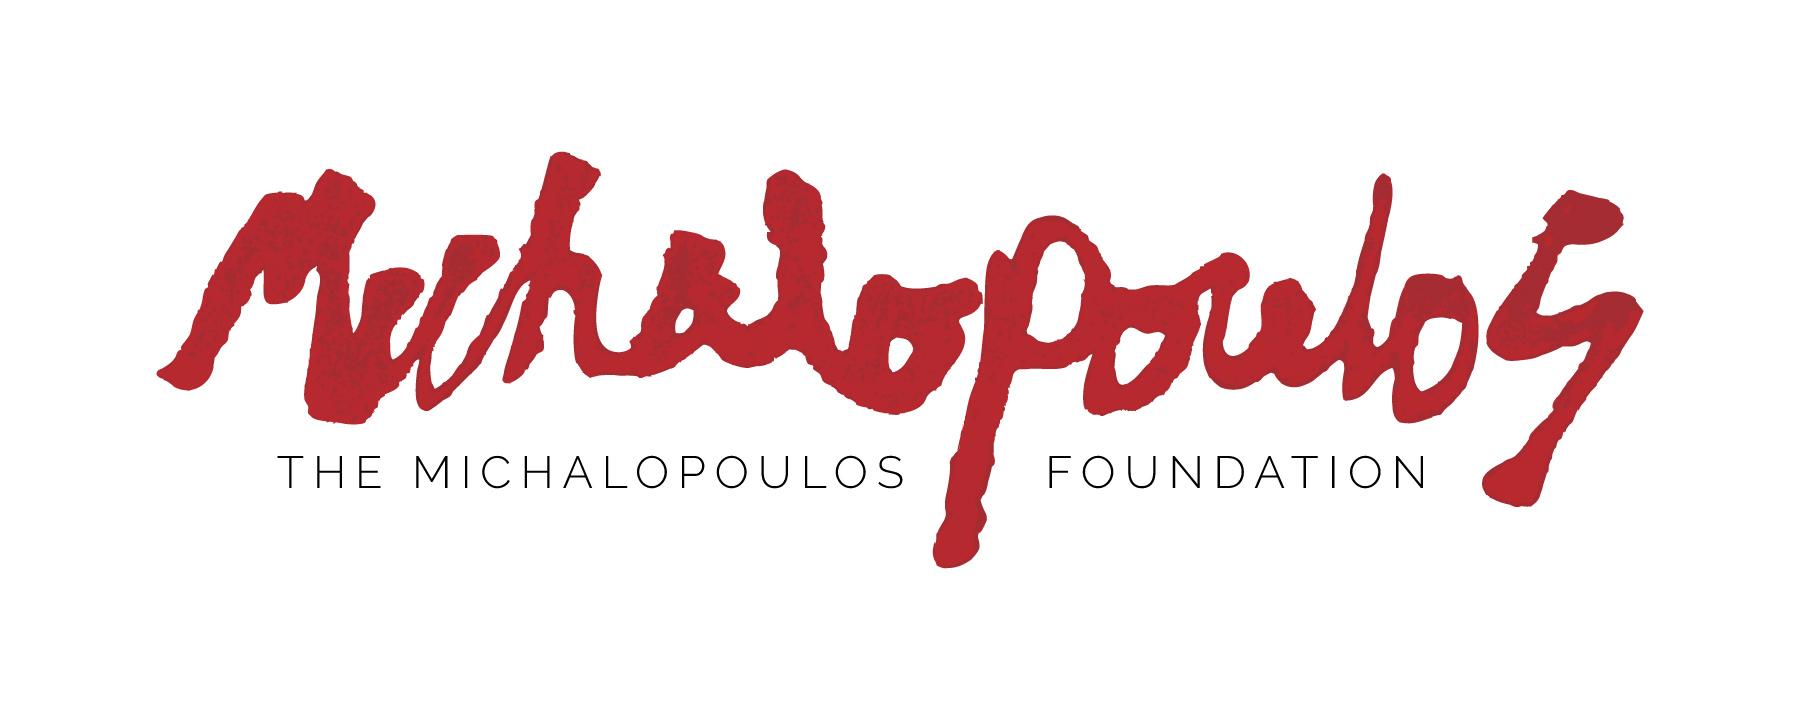 Michalopoulos Foundation - logo.jpg